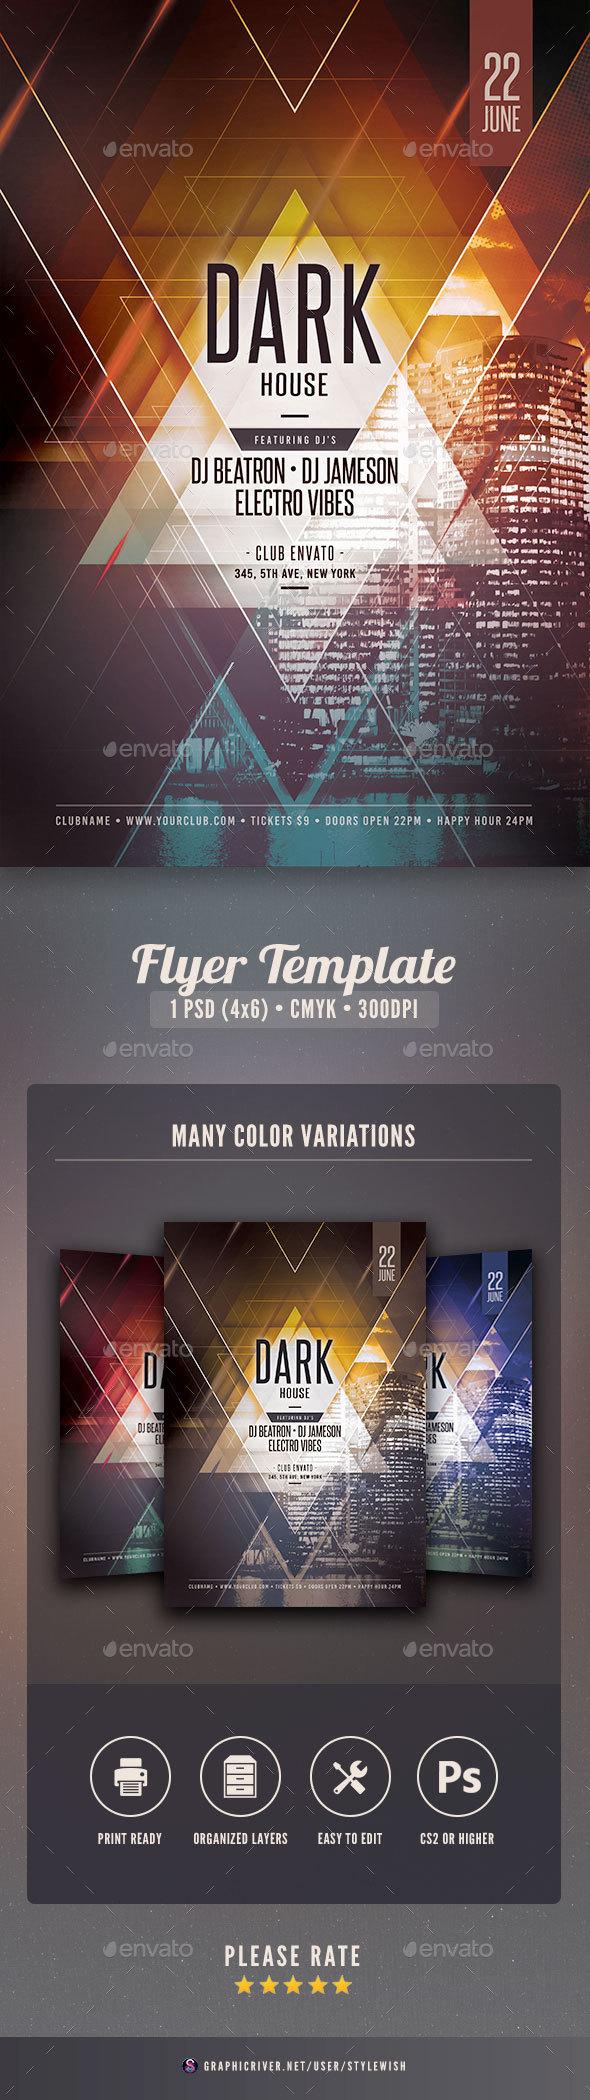 Dark House Flyer | Dark house, Font logo and Flyer template